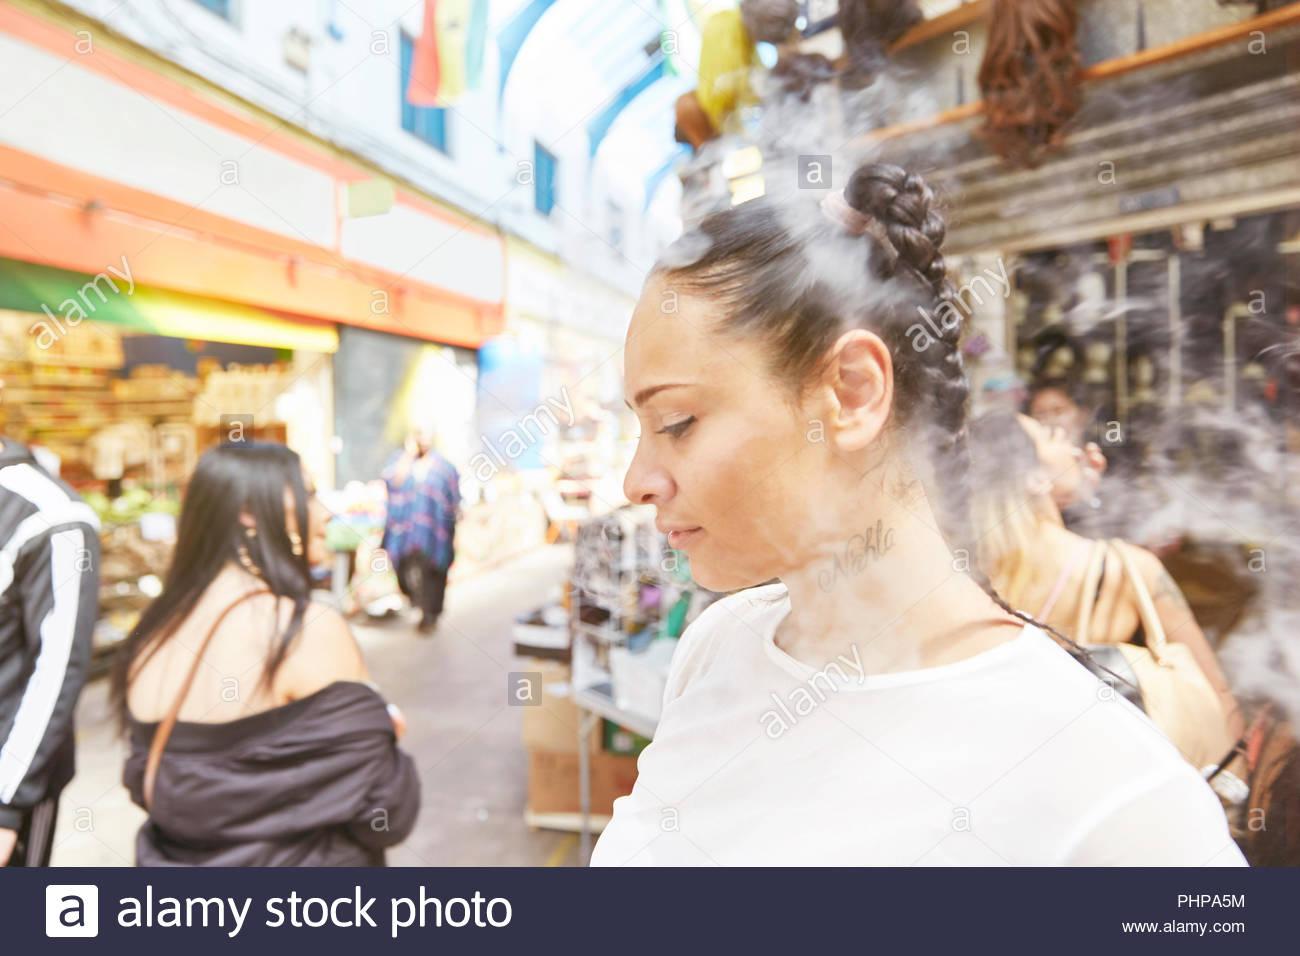 Young woman smoking - Stock Image